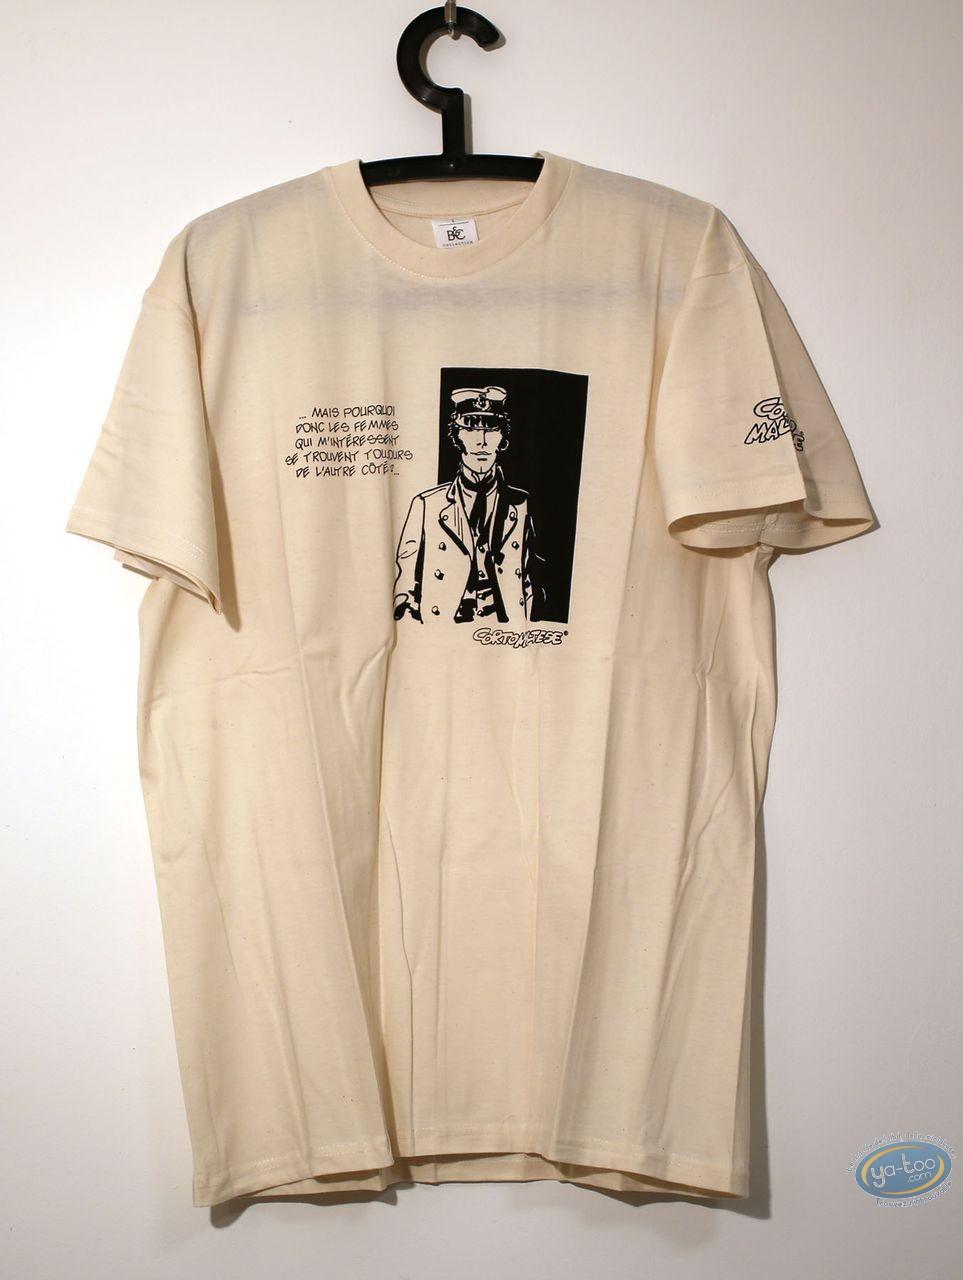 Clothes, Corto Maltese : T-shirt, Corto Maltese : short sleeves Corto The Women size M